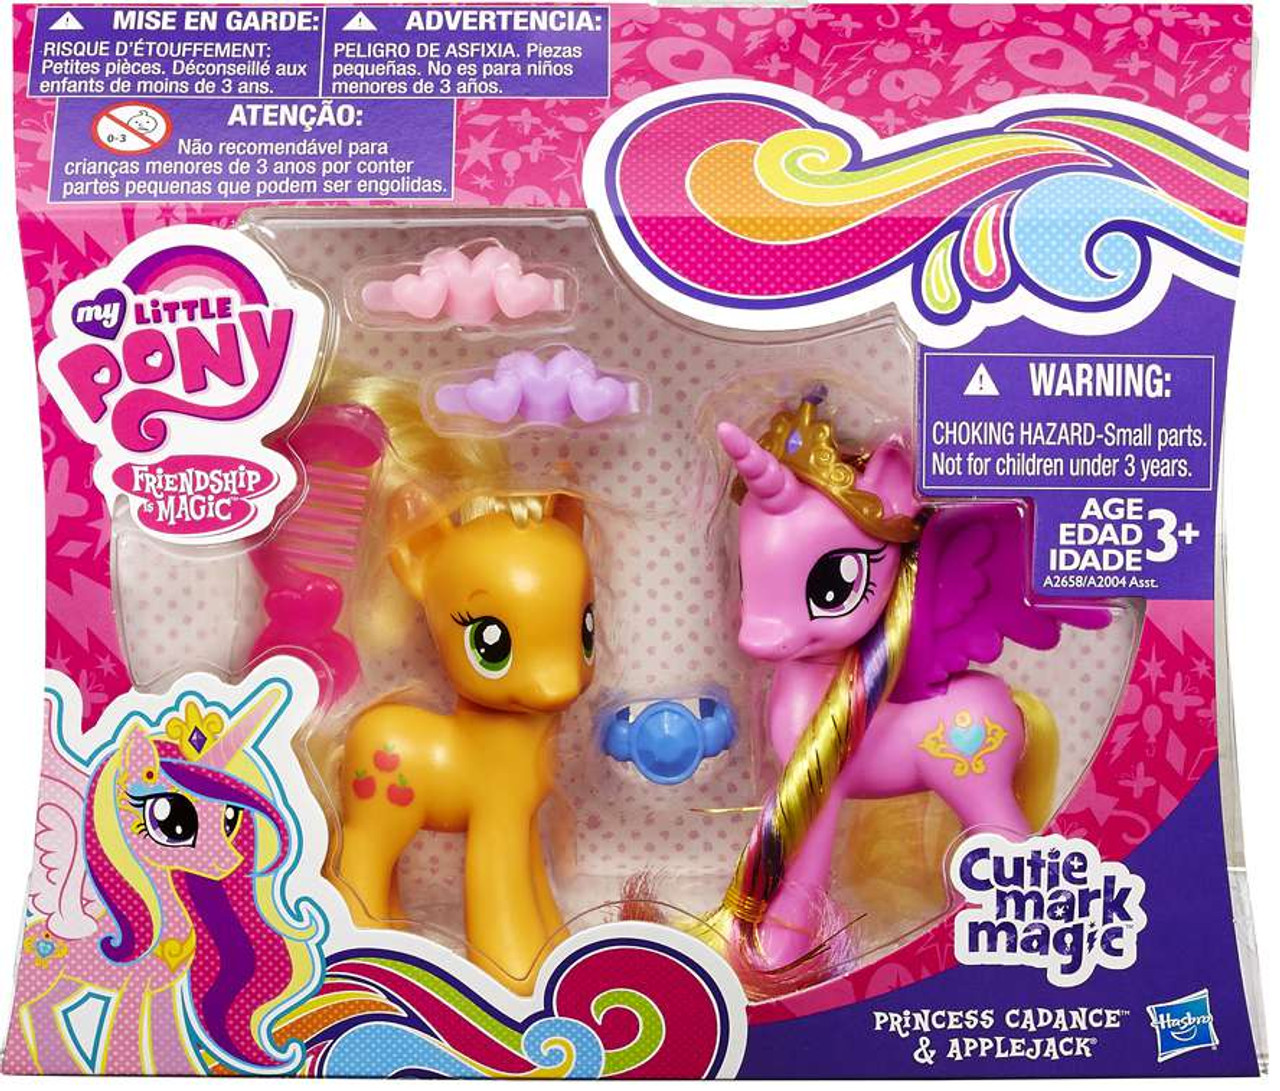 My Little Pony Cutie Mark Magic Princess Cadance